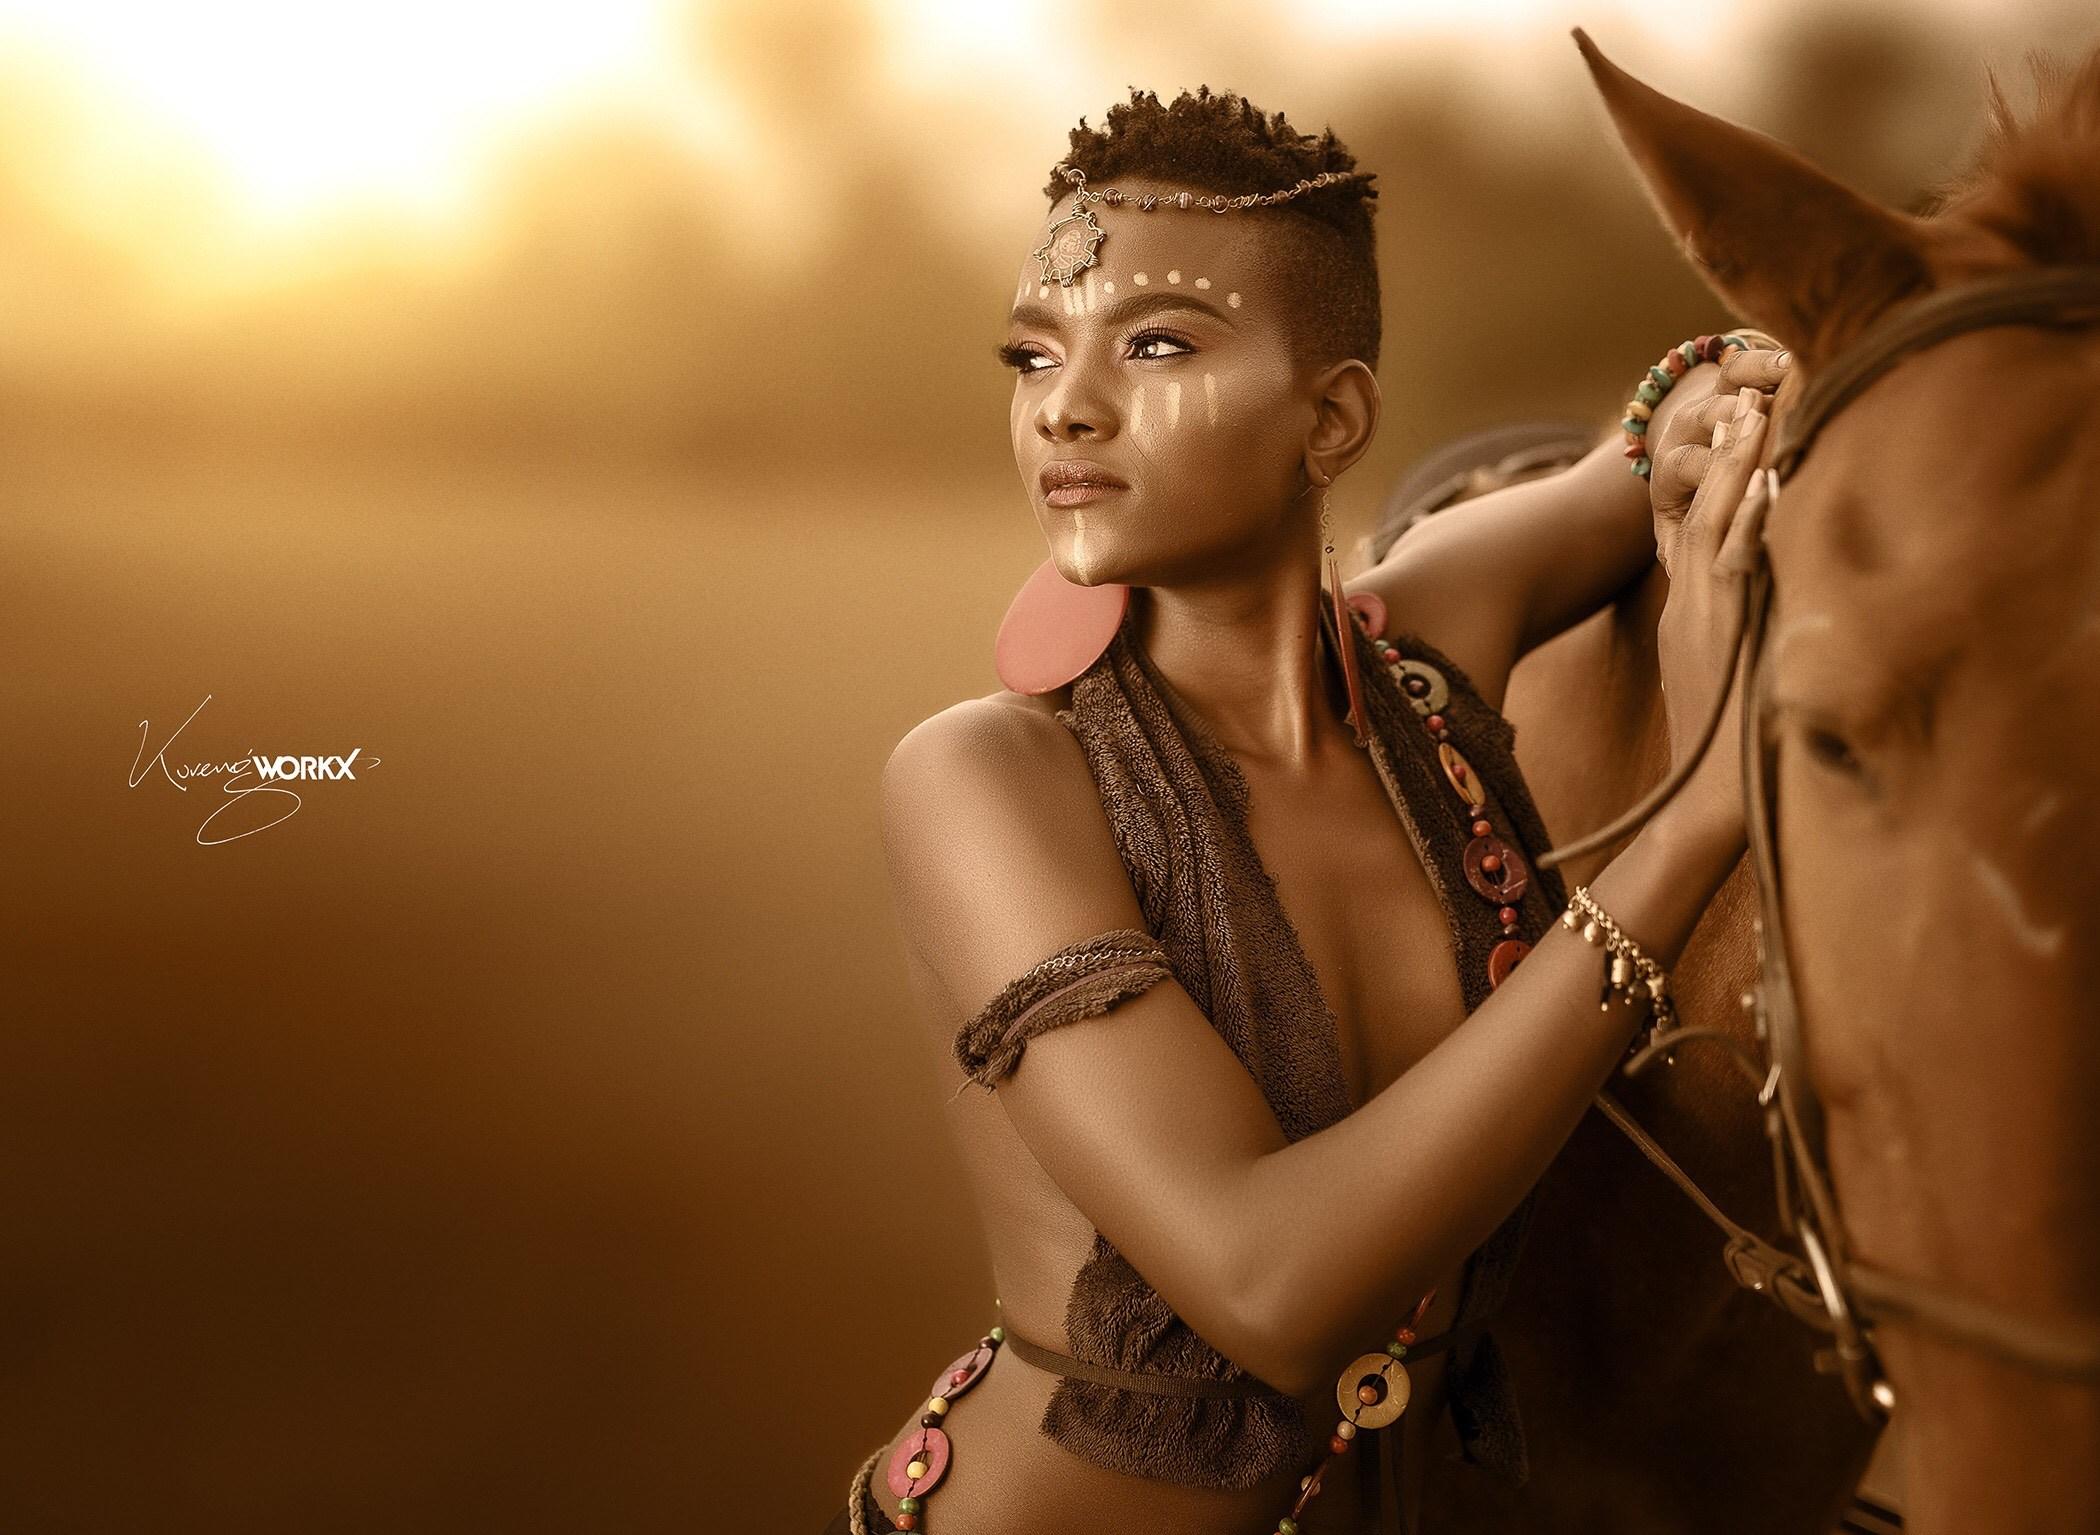 african king kenya menza warrior kenyan wa woman colonialists british allela queen queens visualizes pino legendary tale photographer africa nigeria